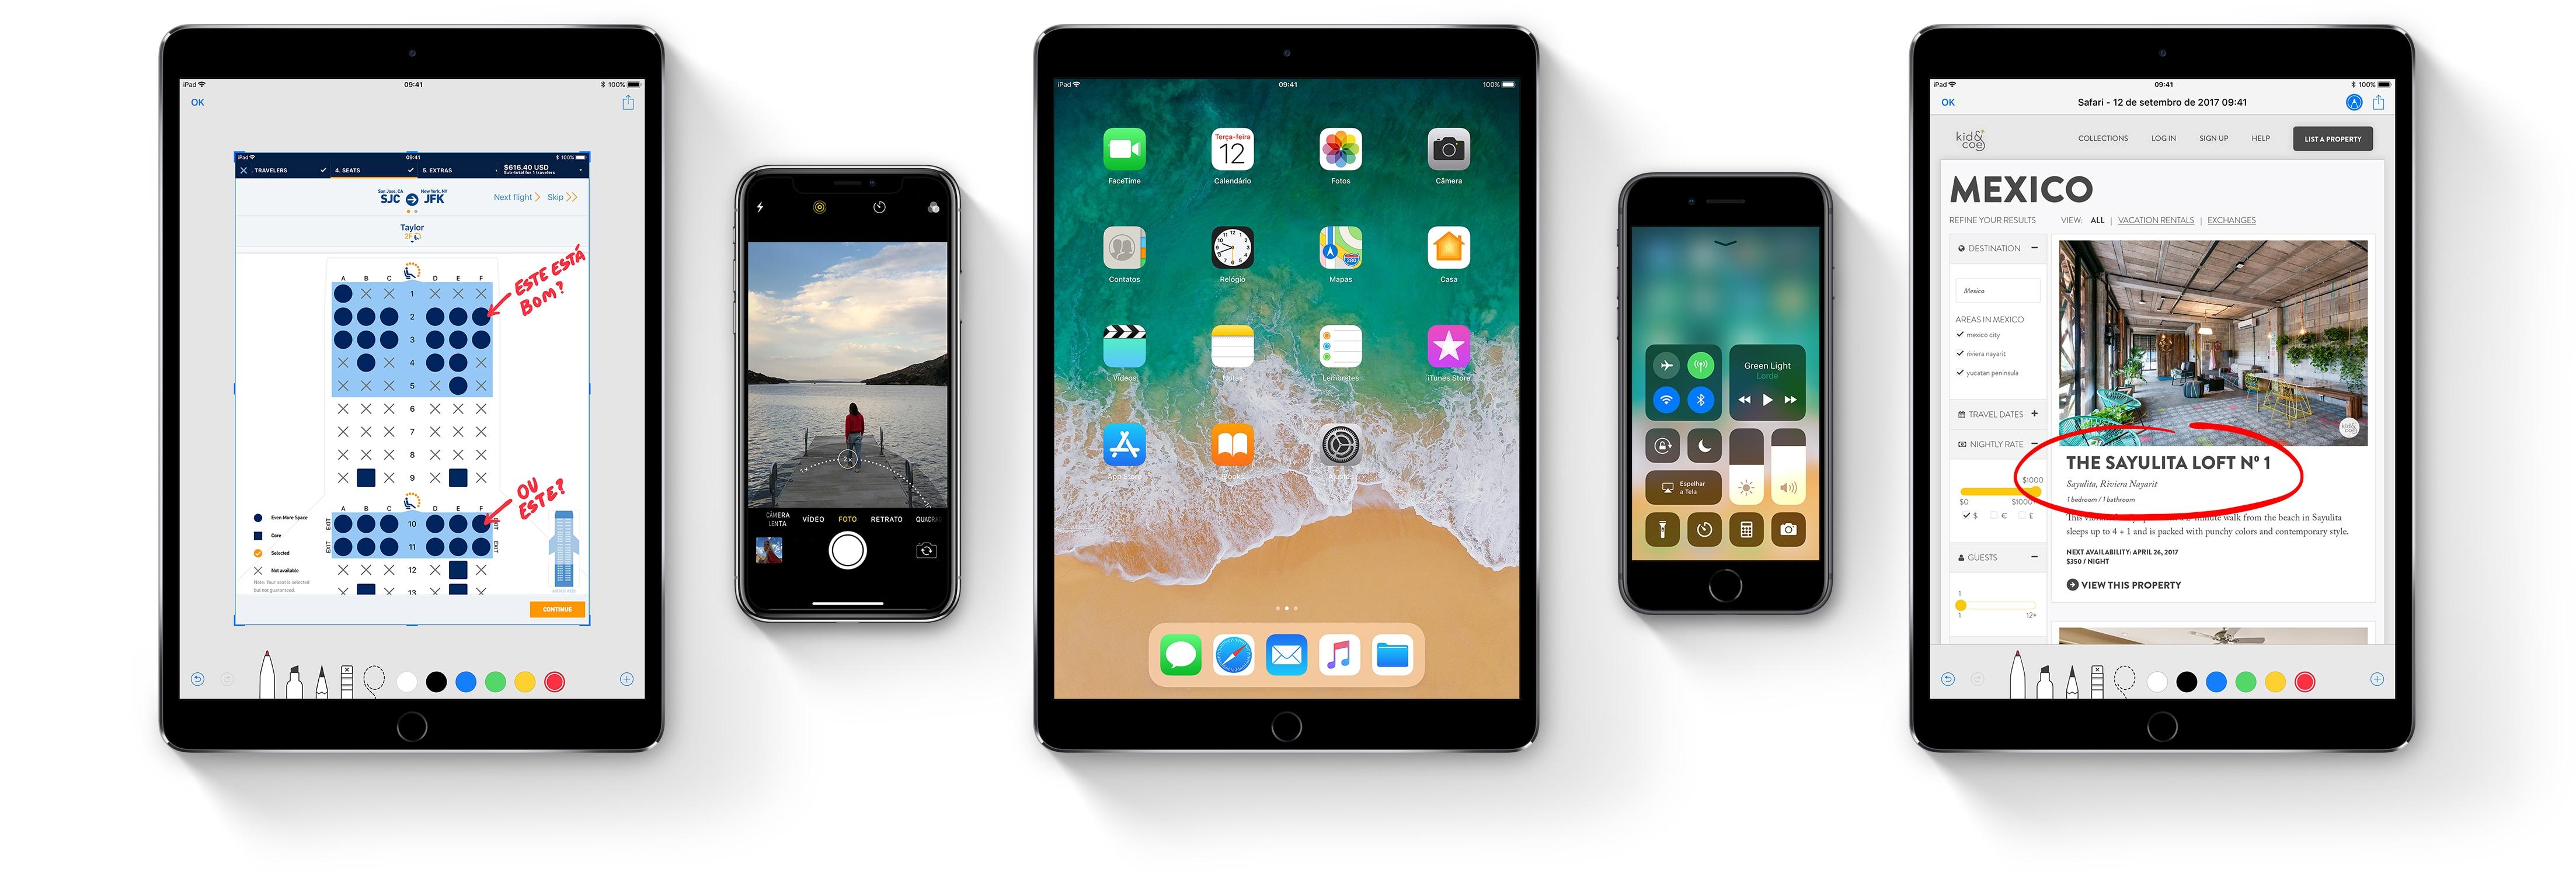 iPhones e iPads rodando o iOS 11